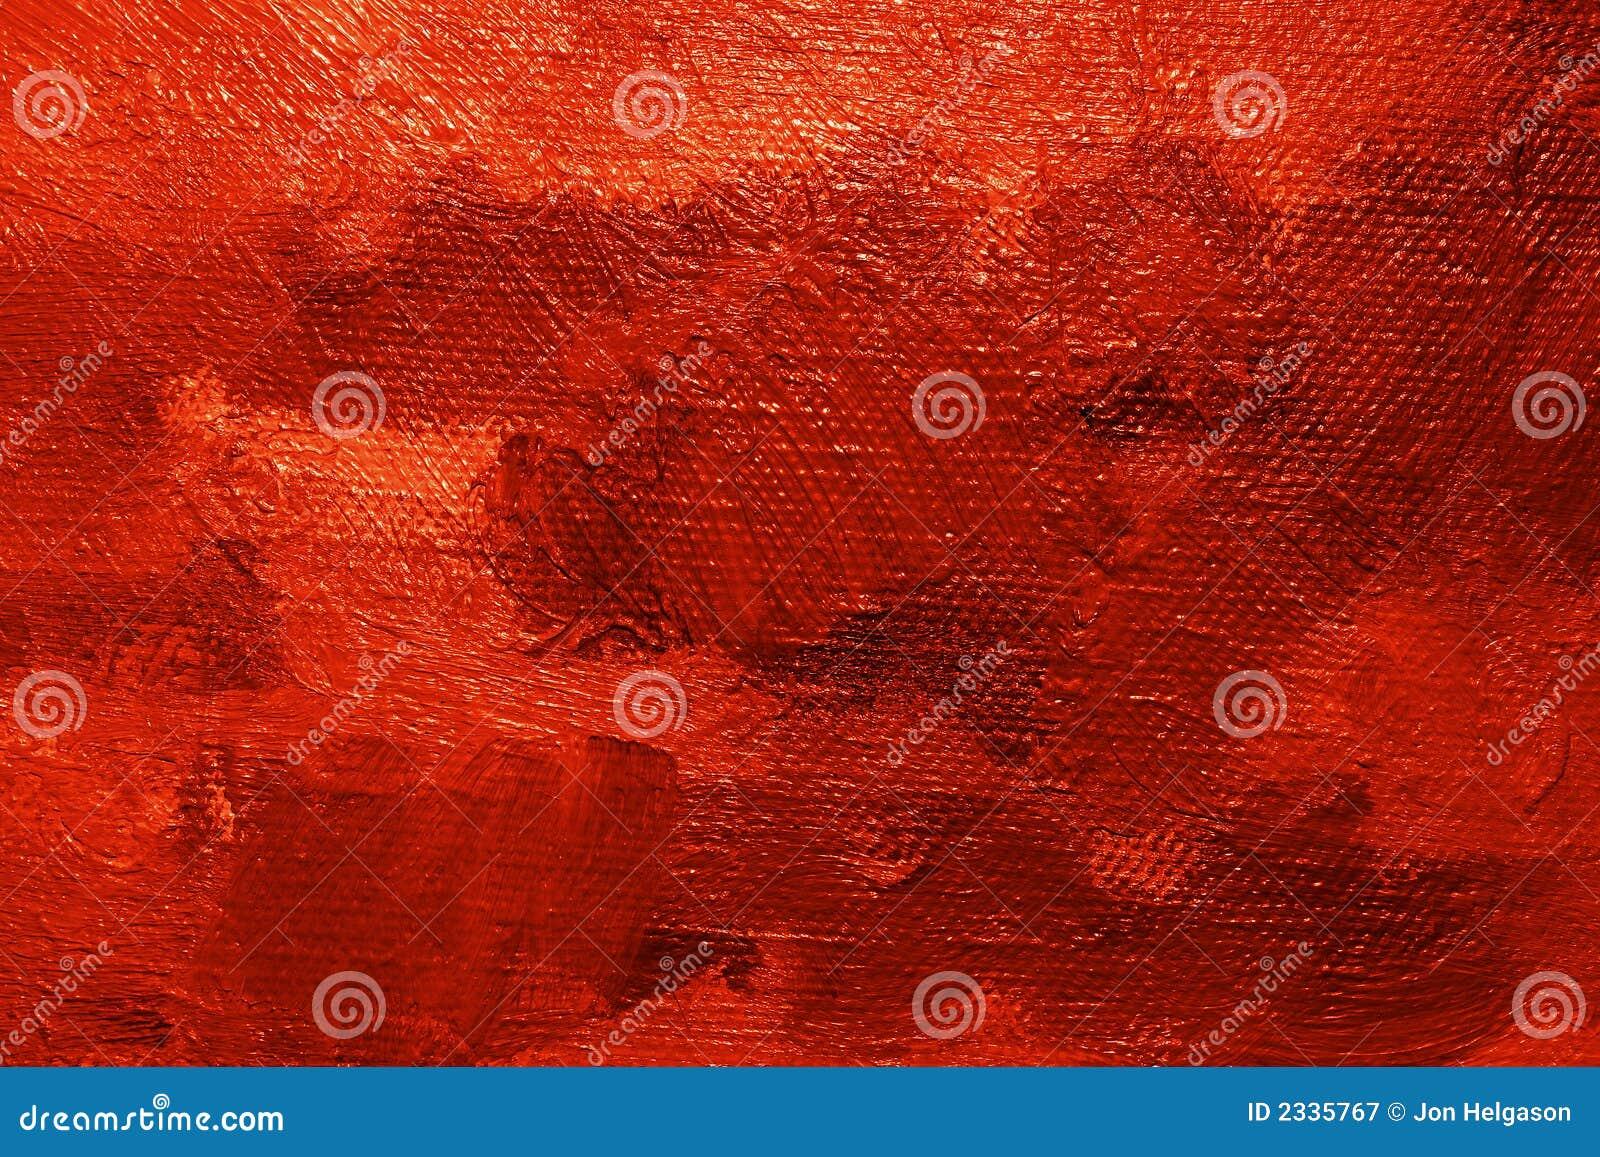 Acrylic Paint Strokes